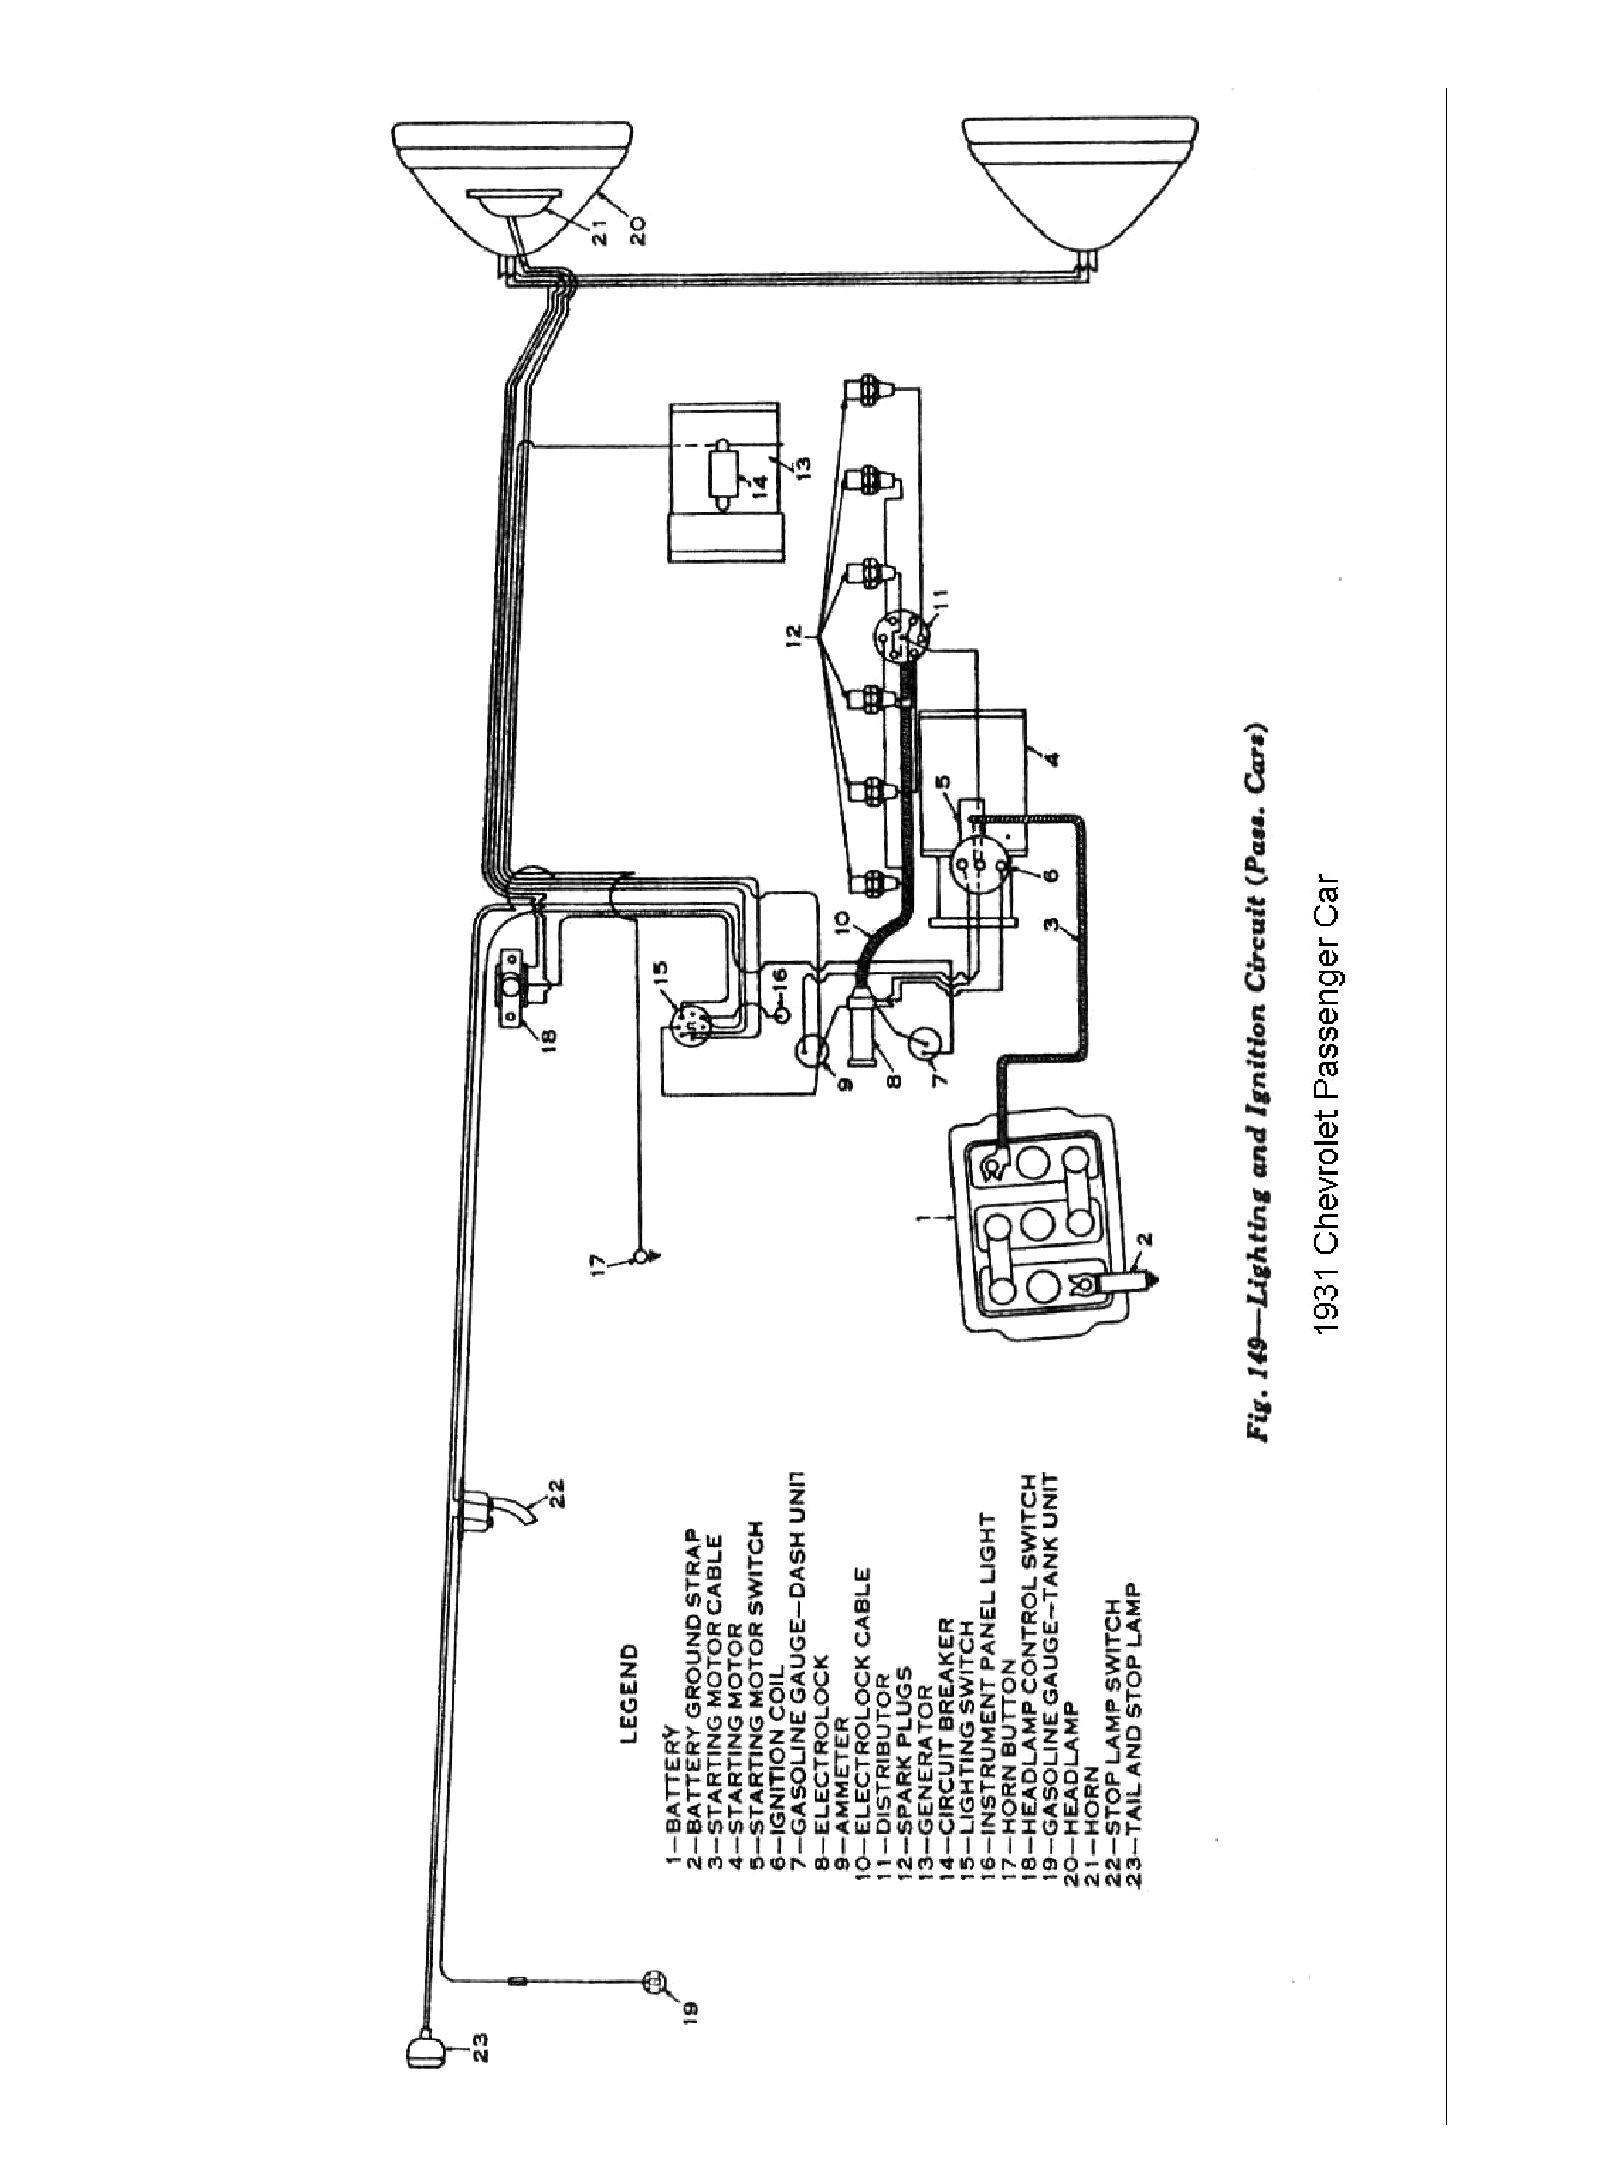 Lovely Marine Fuel Sending Unit Wiring Diagram Gallery The Best Tearing